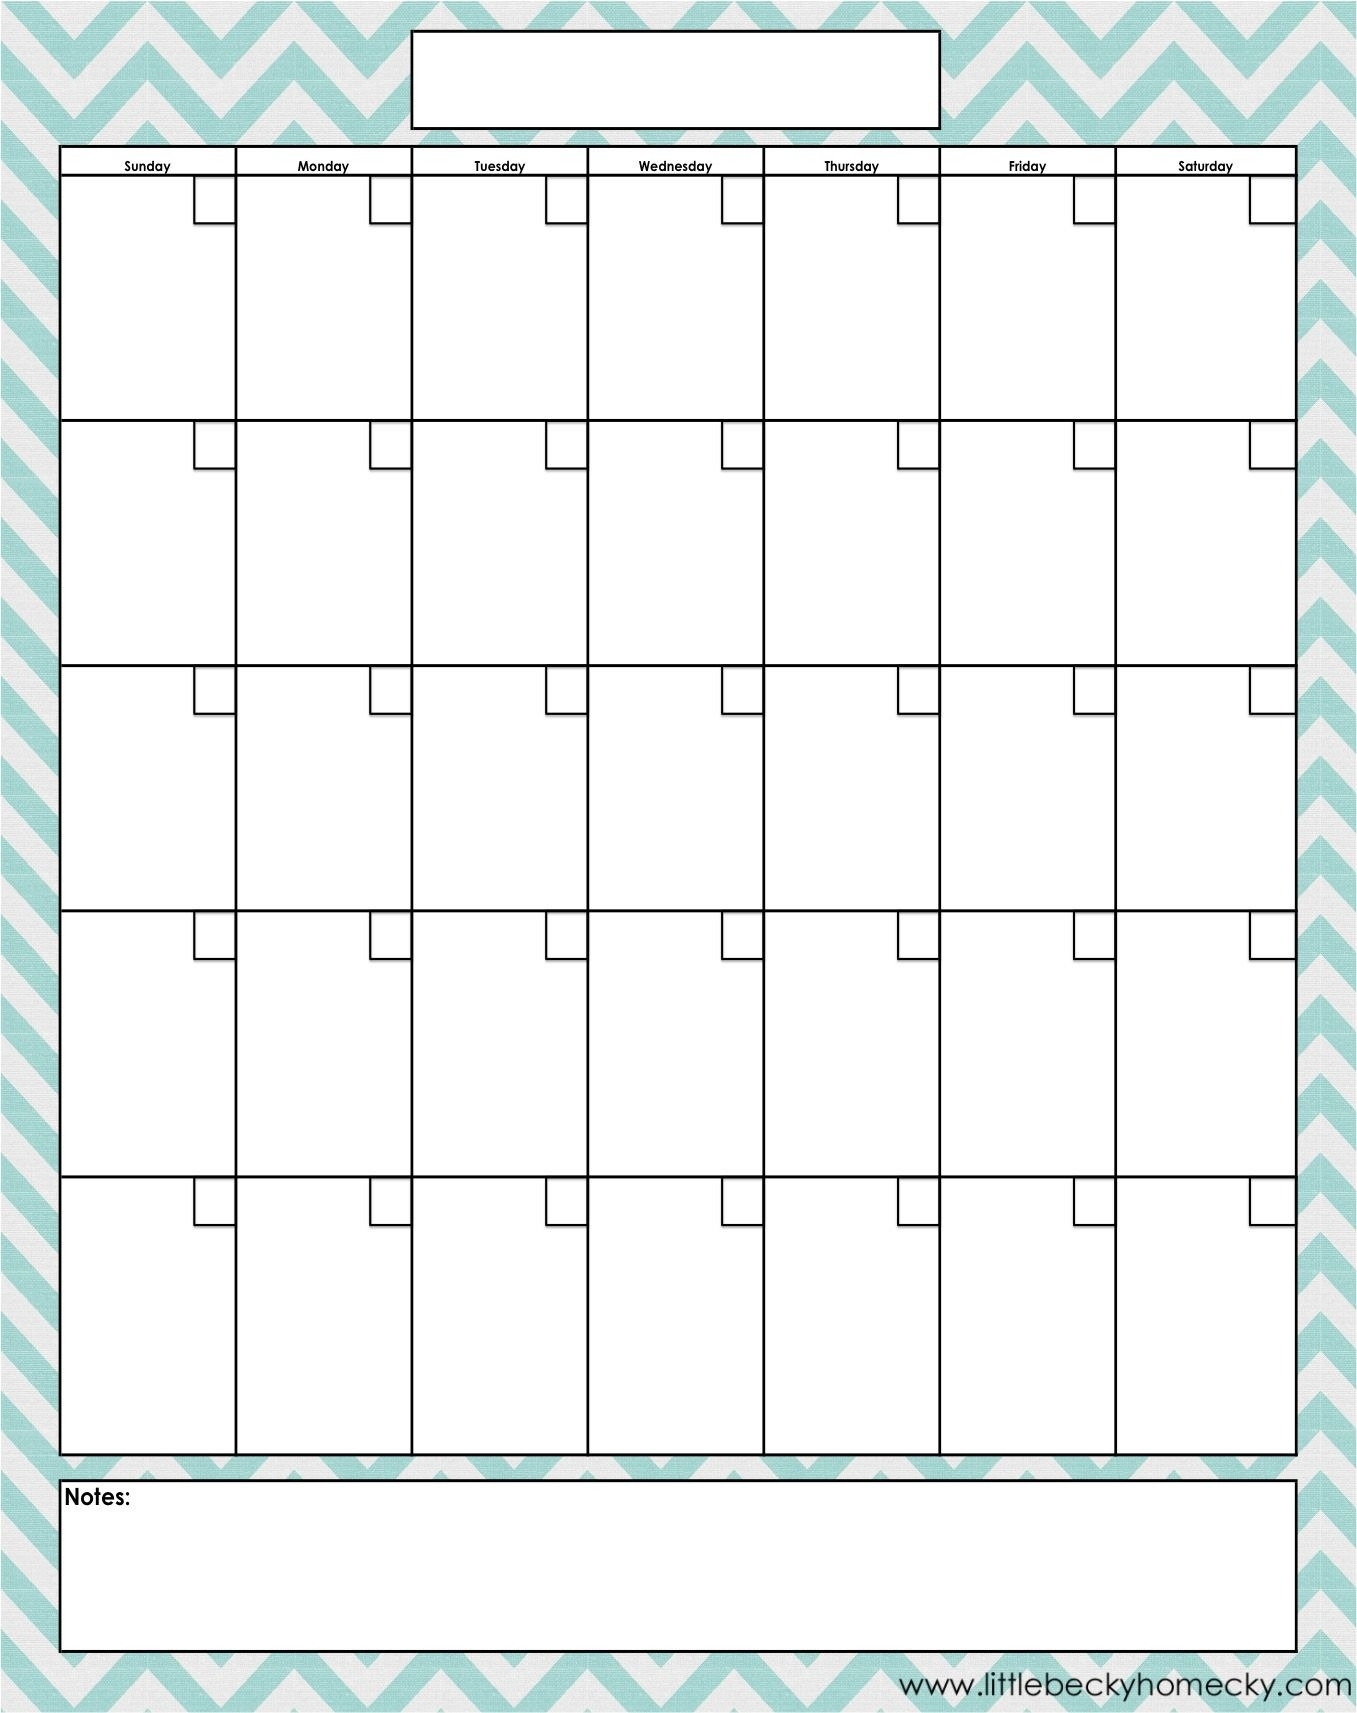 Monthly Calendar Print Out | Calendar Templates Free | Calendar Free Monthly Calendar To Print Free